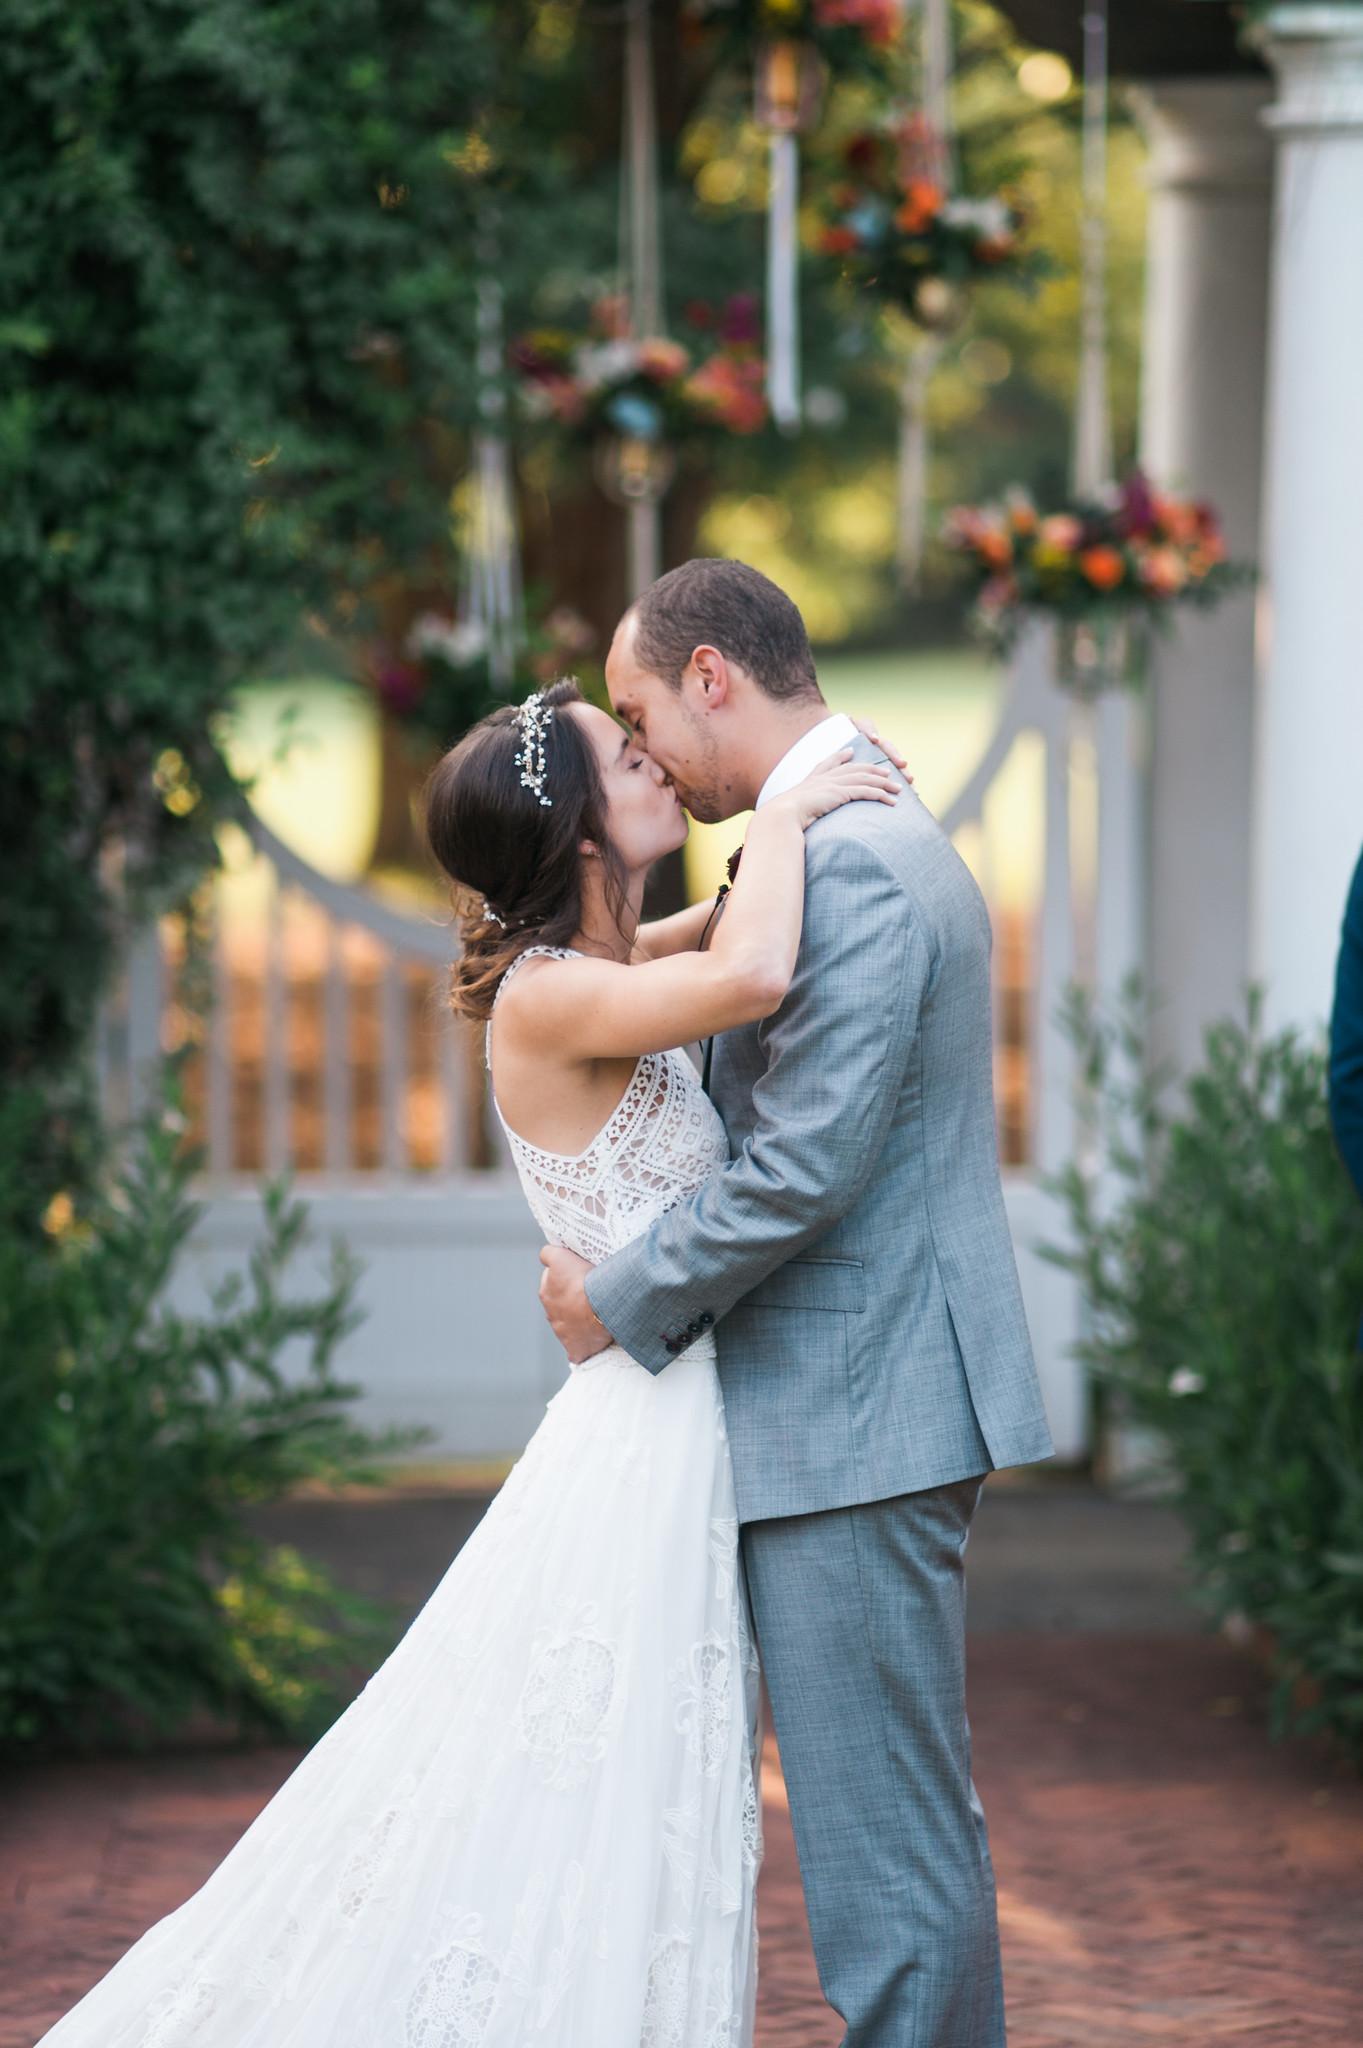 thomas-wedding-234-X4.jpg